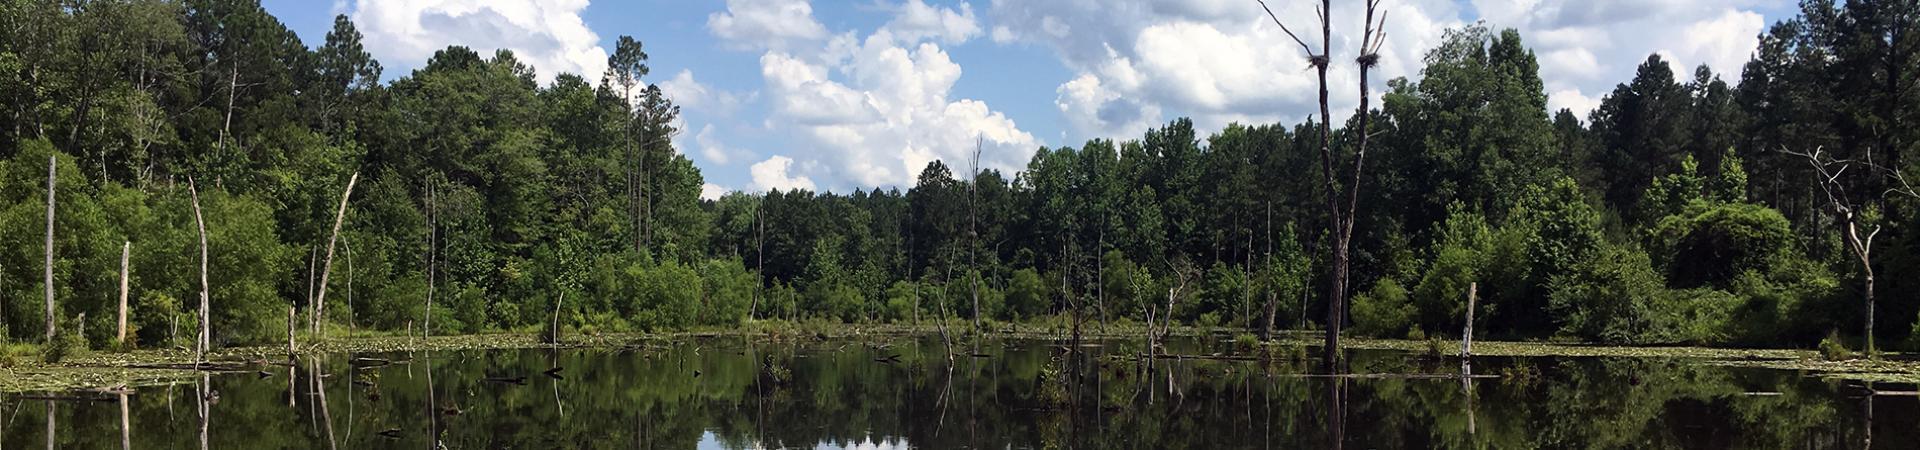 Creek at Lanahassee Creek